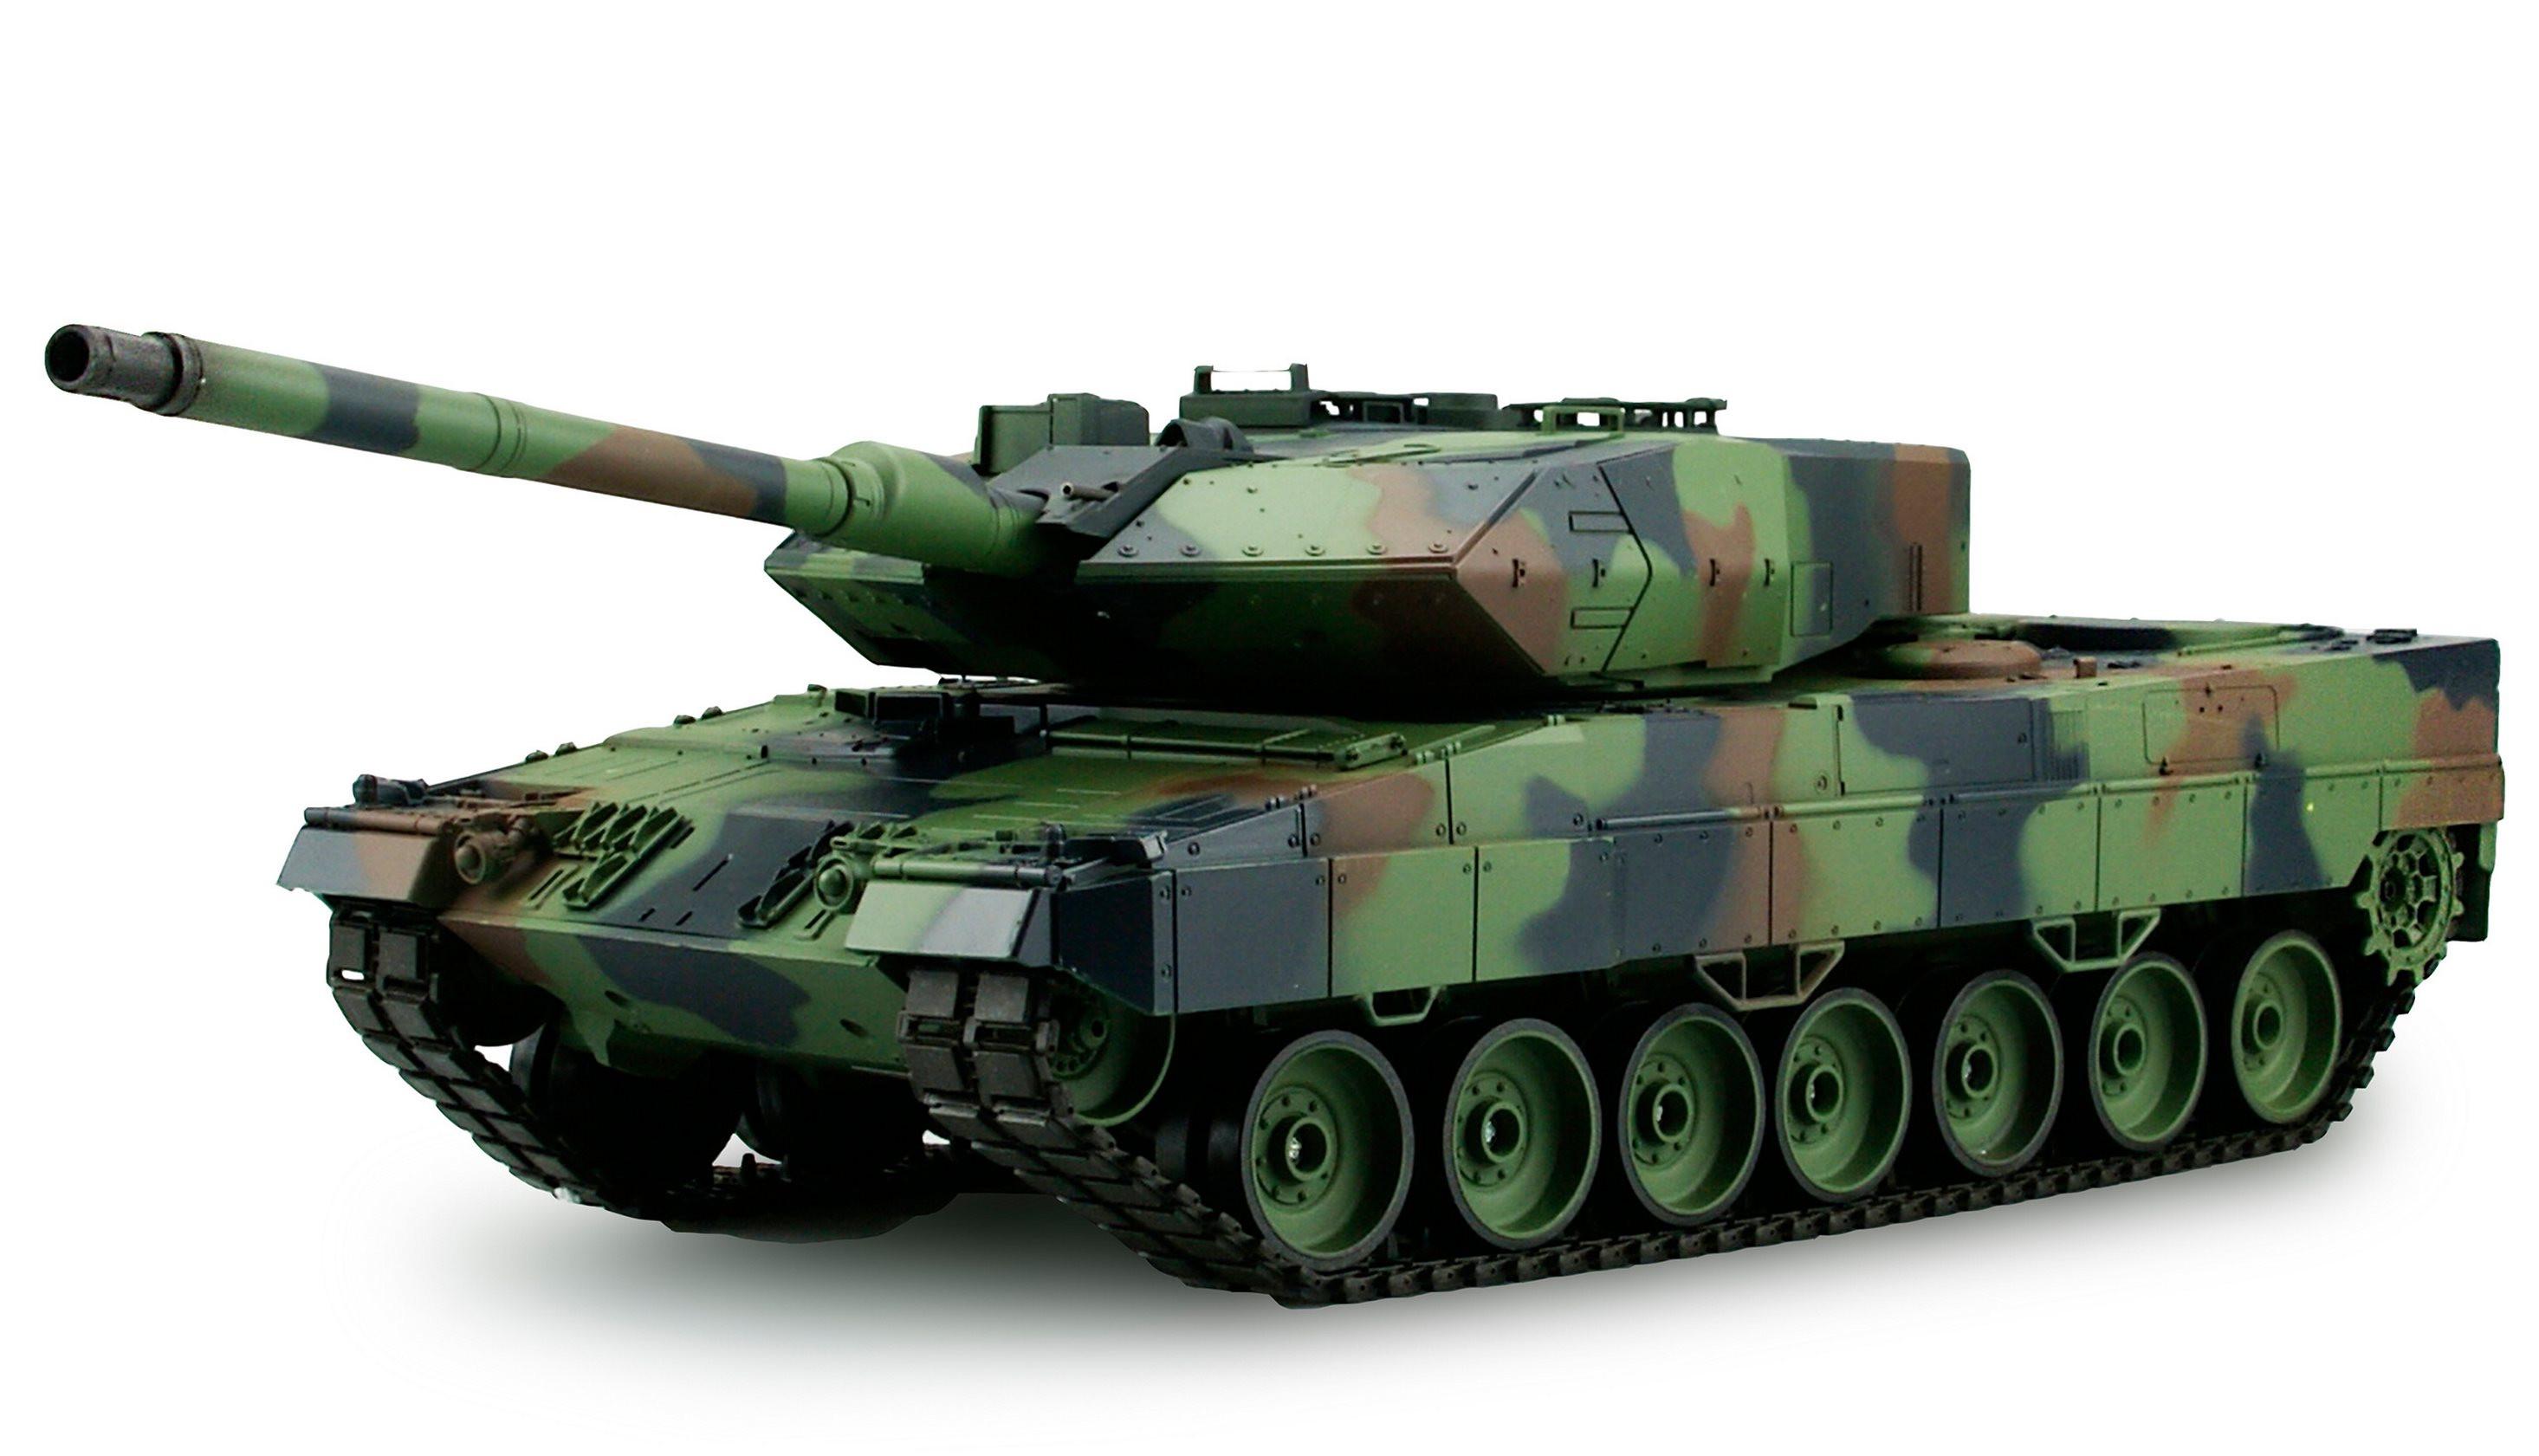 Amewi 23034 - Funkgesteuerter (RC) Panzer - 1:16 - Betriebsbereit (RTR) - Camouflage - 2,4 GHz